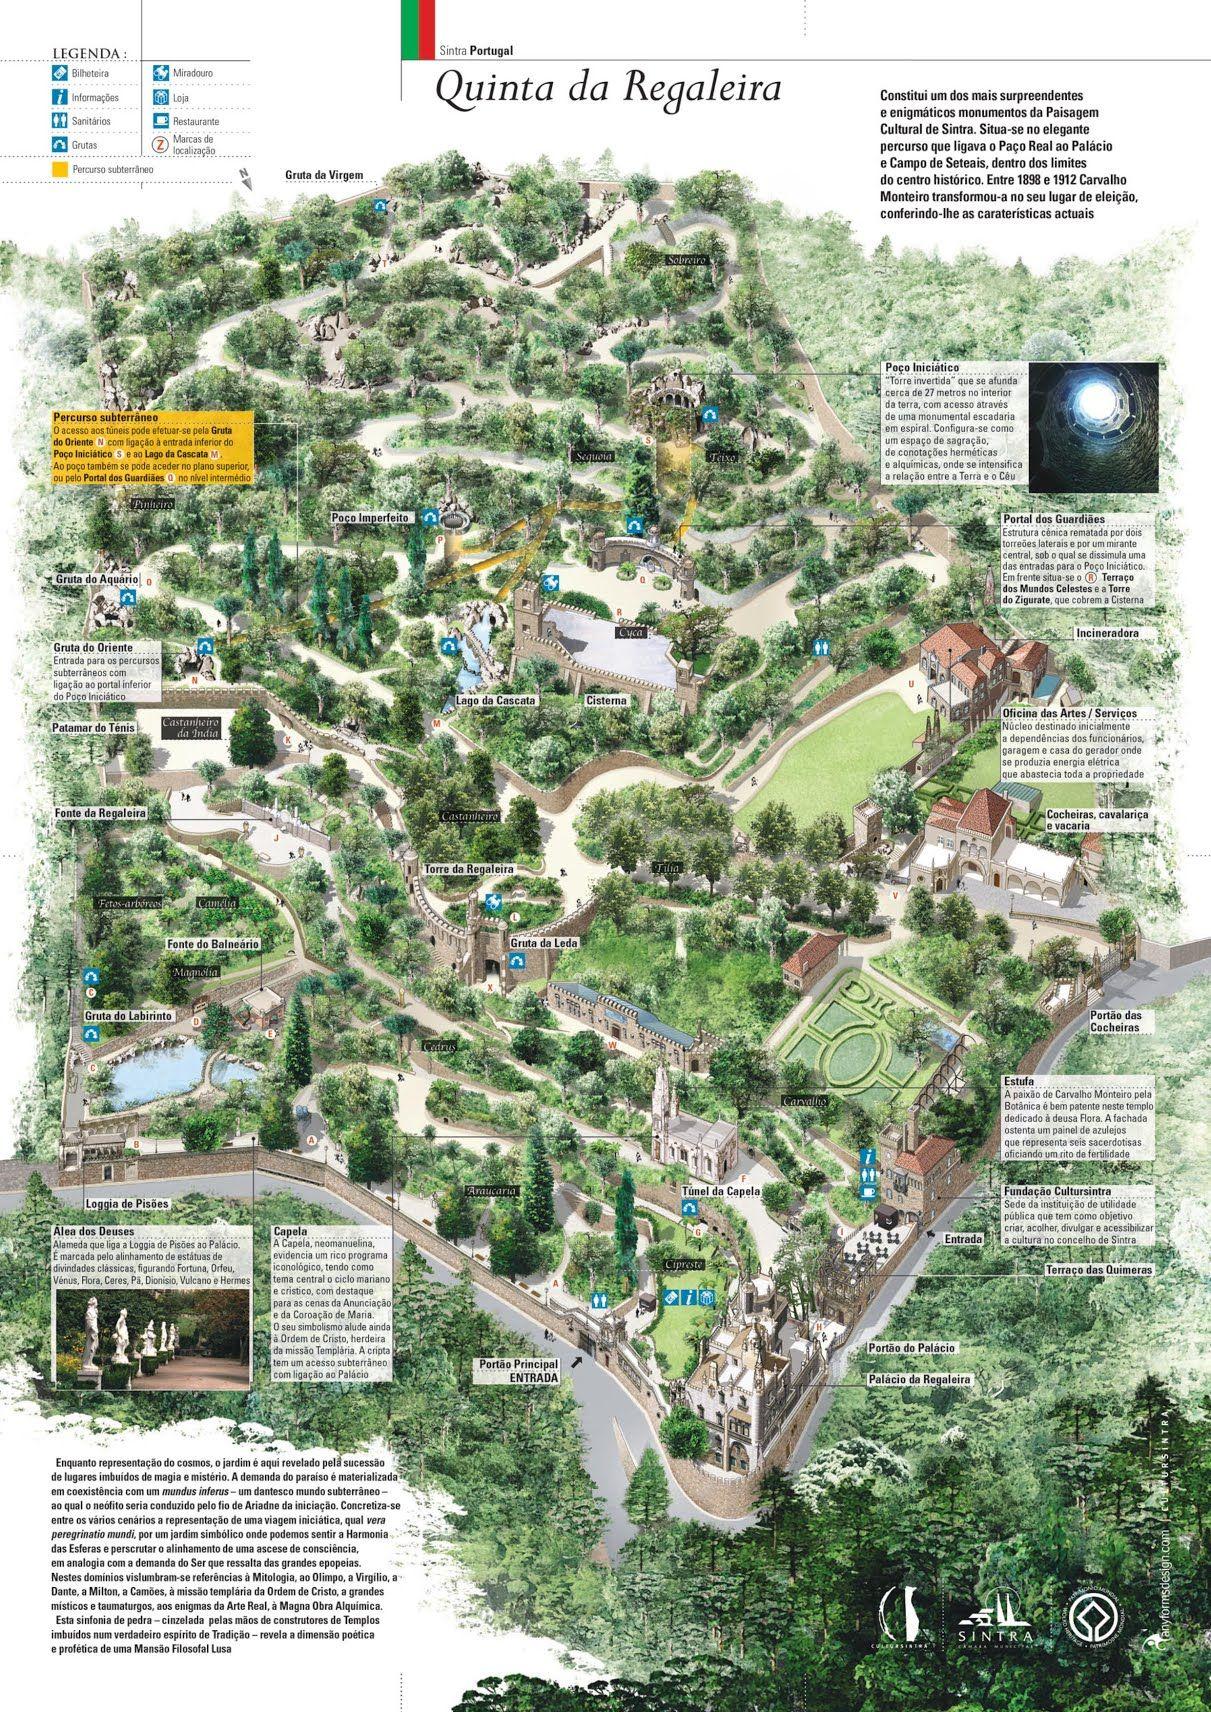 quinta da regaleira mapa Mapa da Quinta da Regaleira   Sintra  Portugal   Portugal  quinta da regaleira mapa